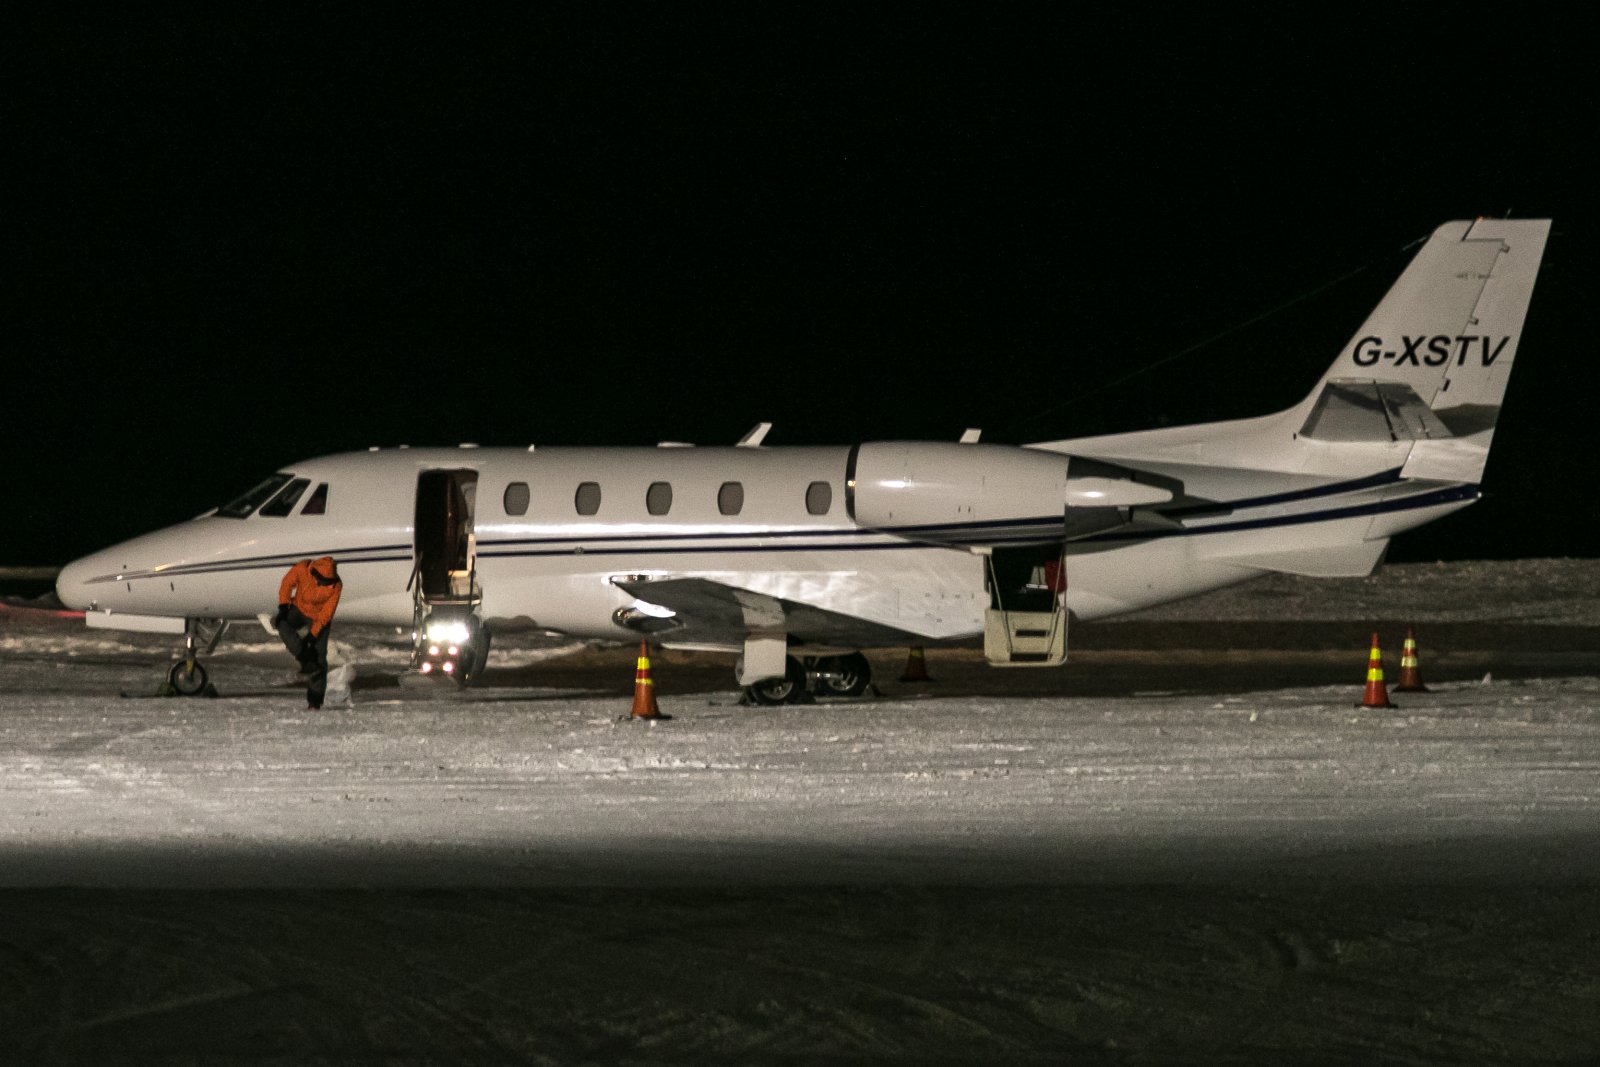 G-XSTV. 17.12.2018. Cessna Citation XLS